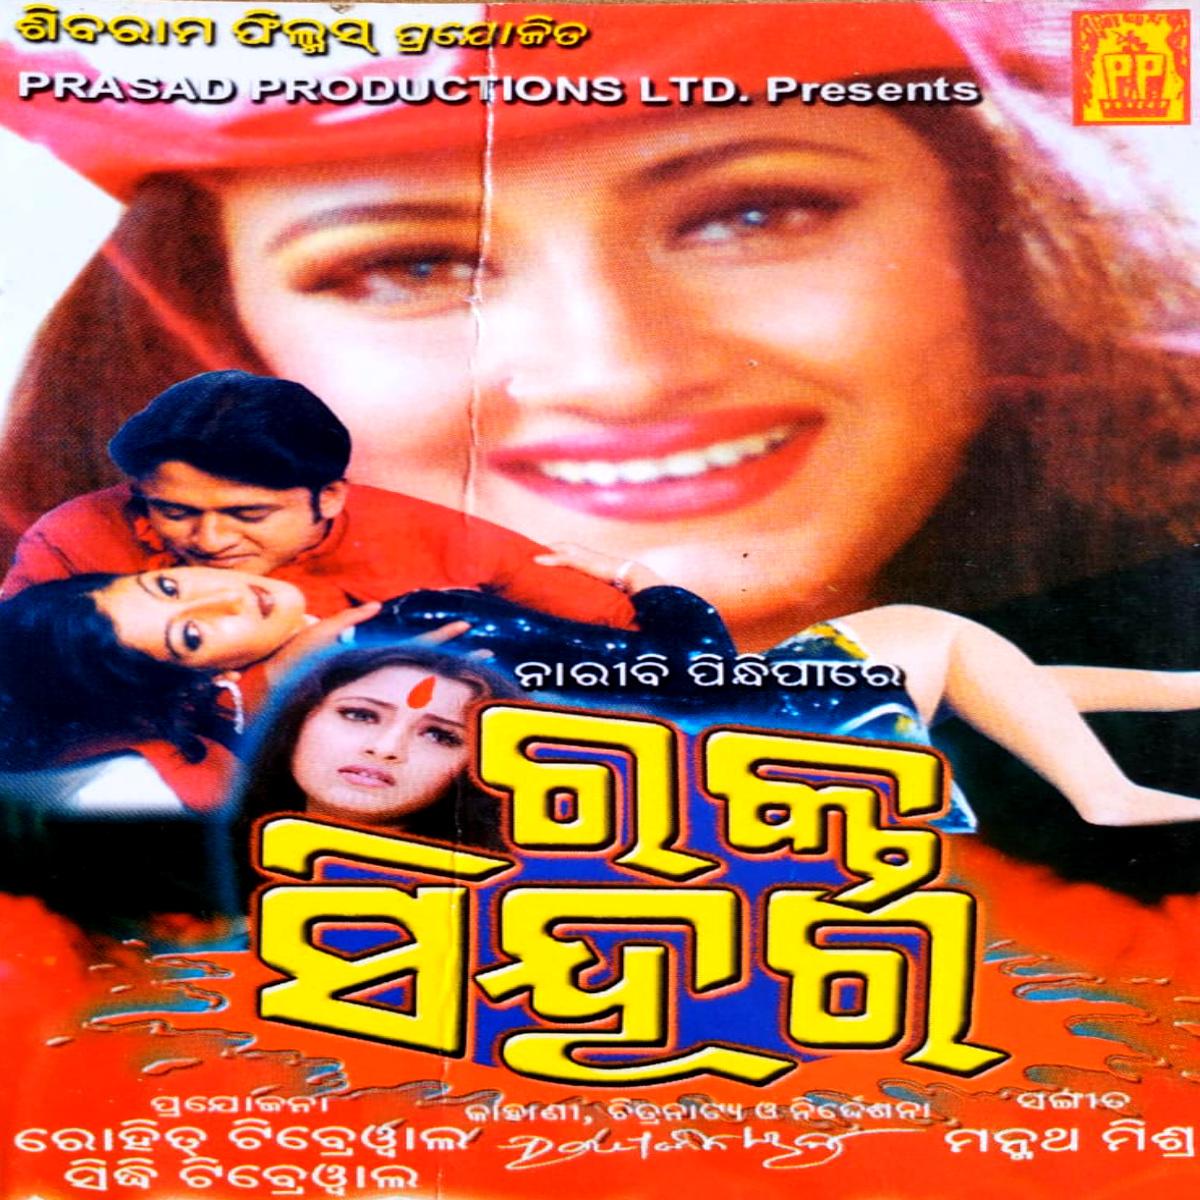 Chiki Chiki Chikei Hasi Aau Hasei (Kumar Sanu, Sadhana Sargam)